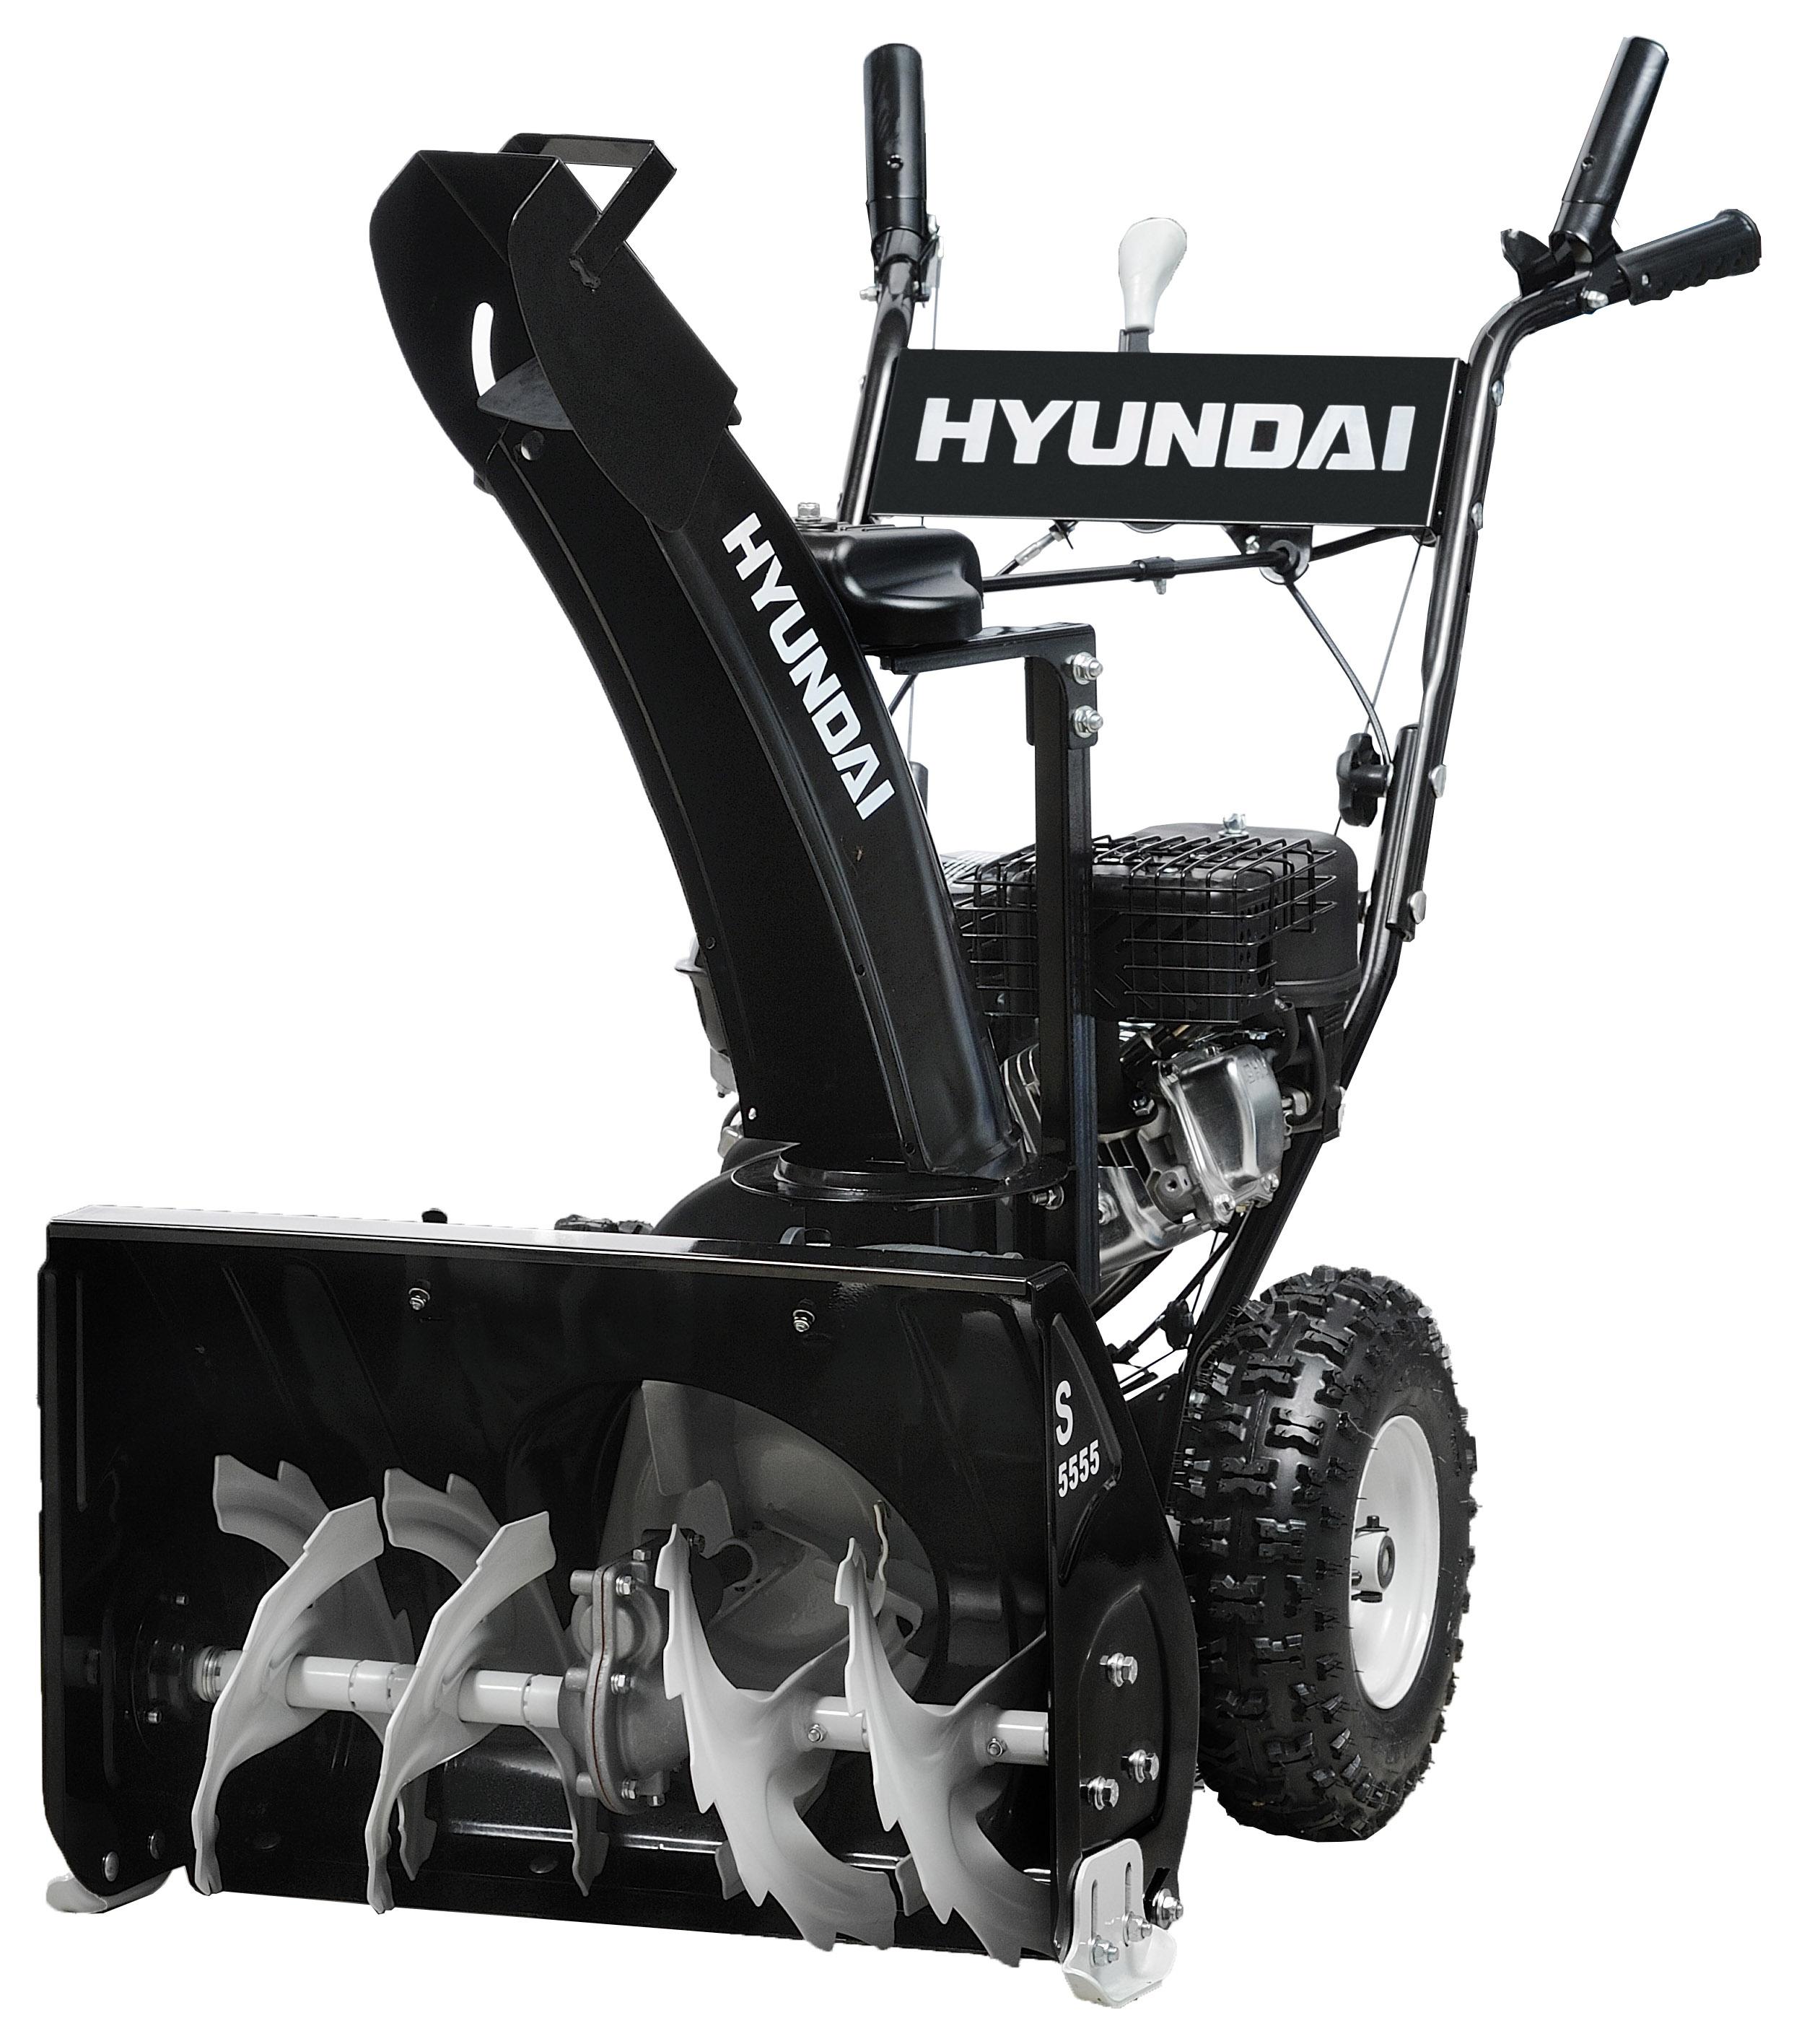 Cнегоуборщик hyundai s 5555 отзывы